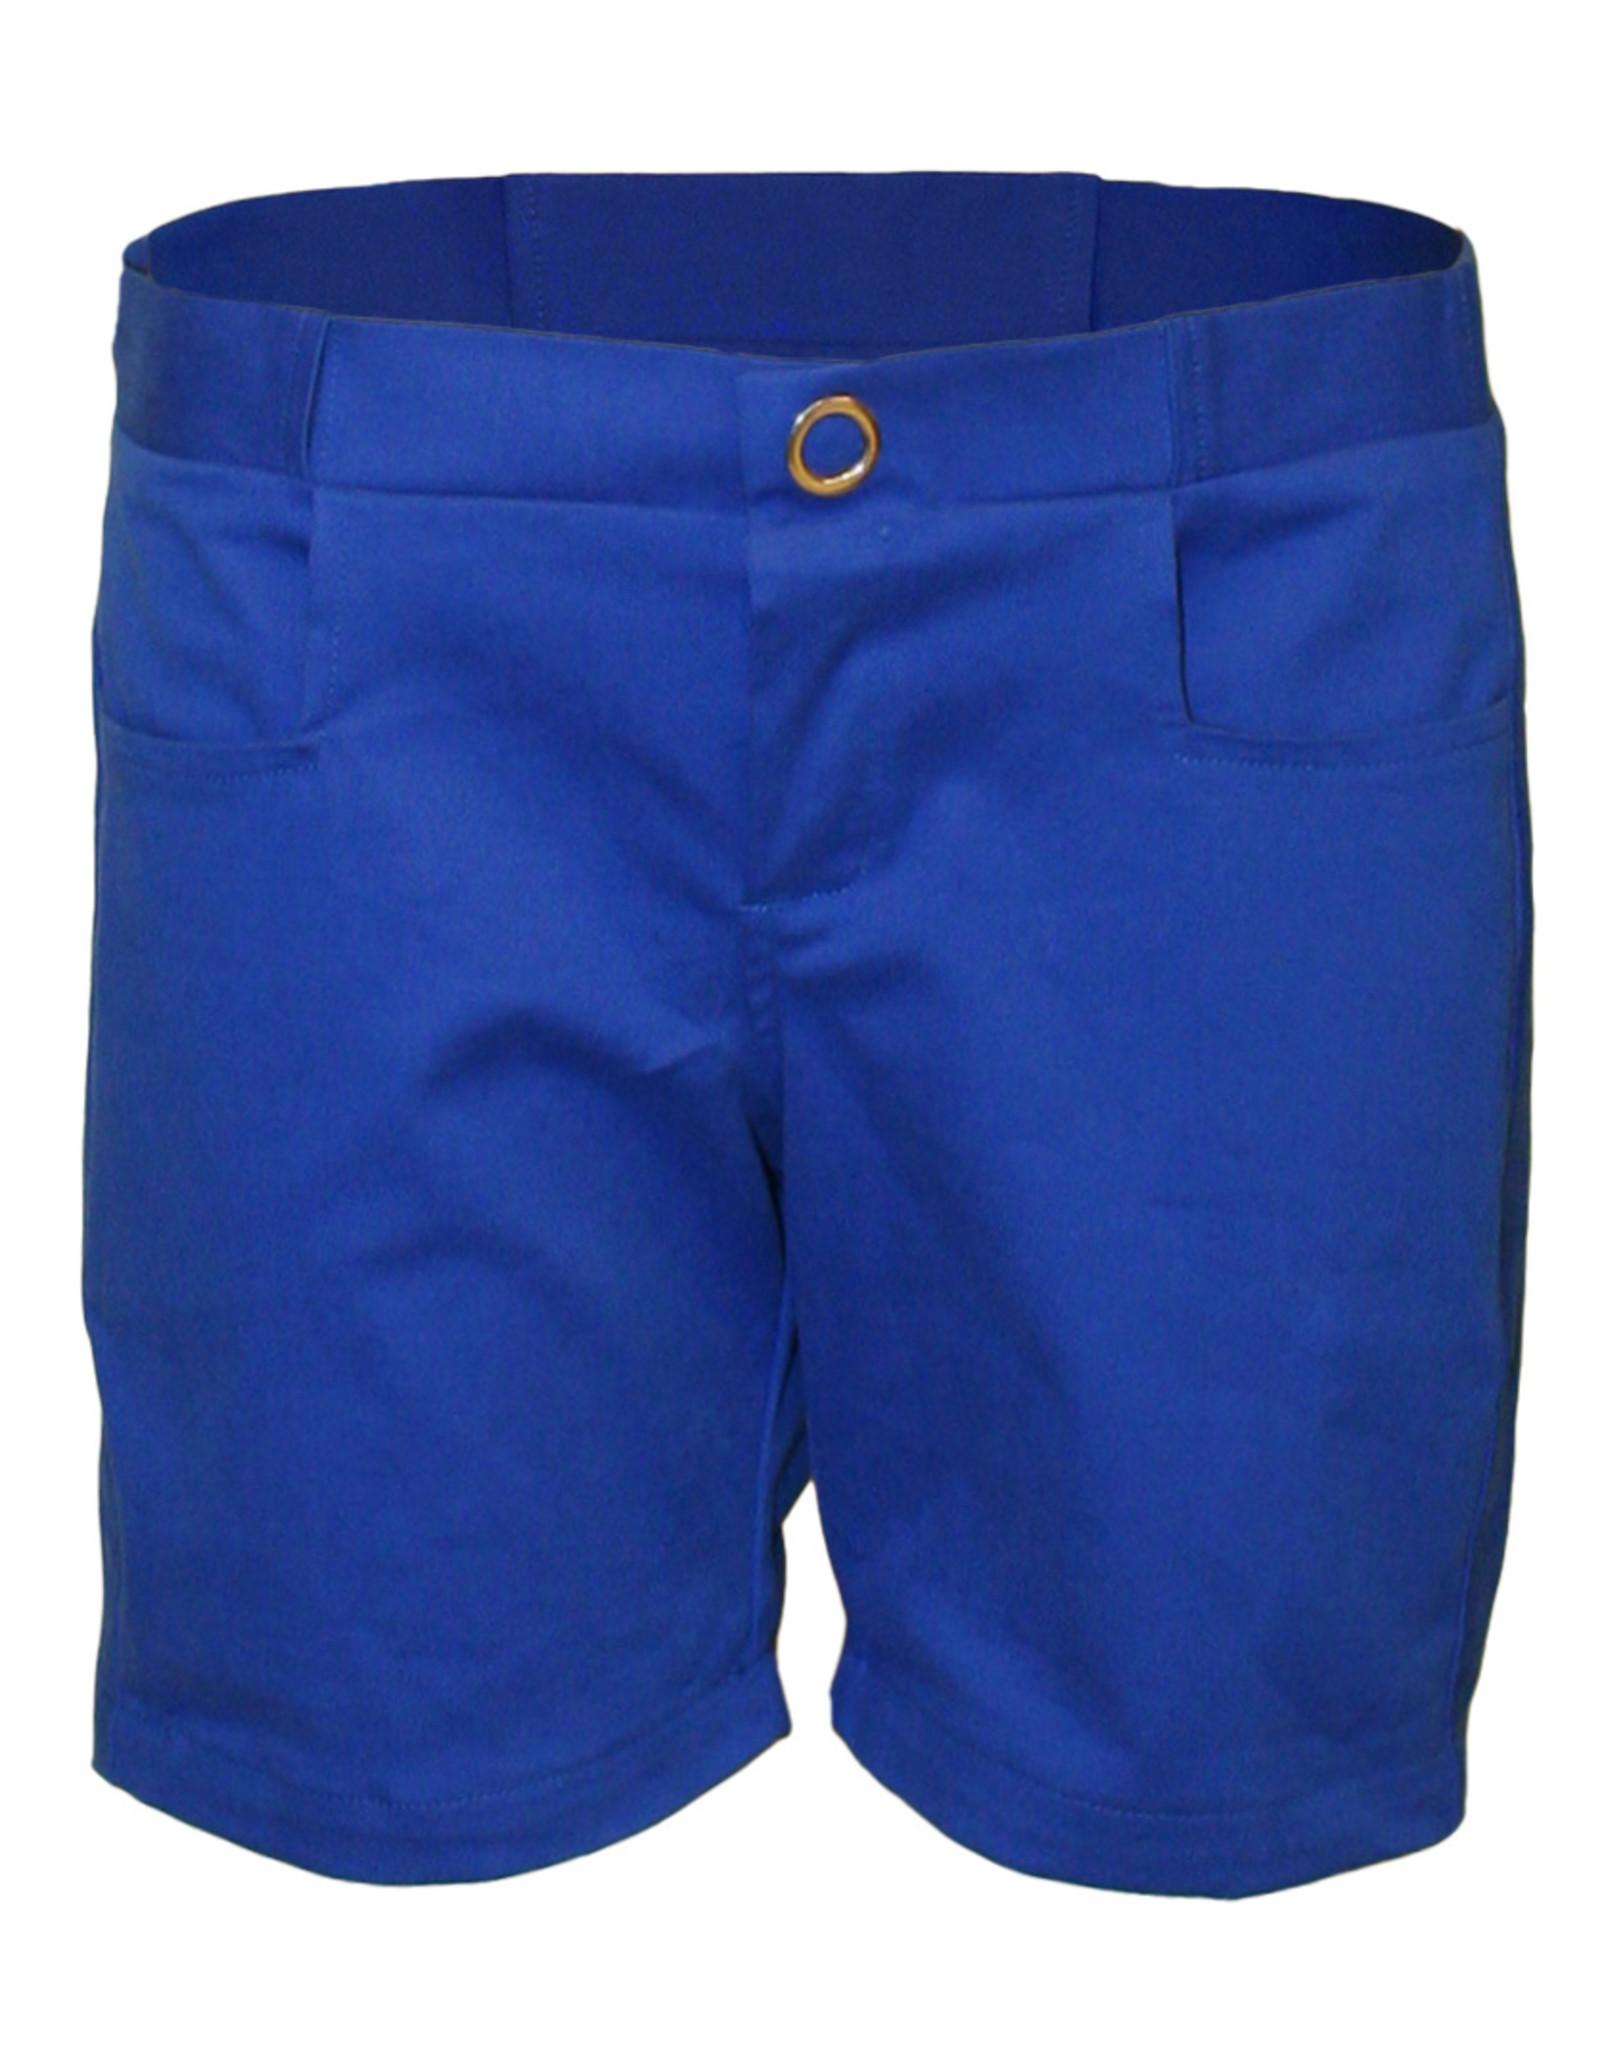 format TREK shorts, canvas